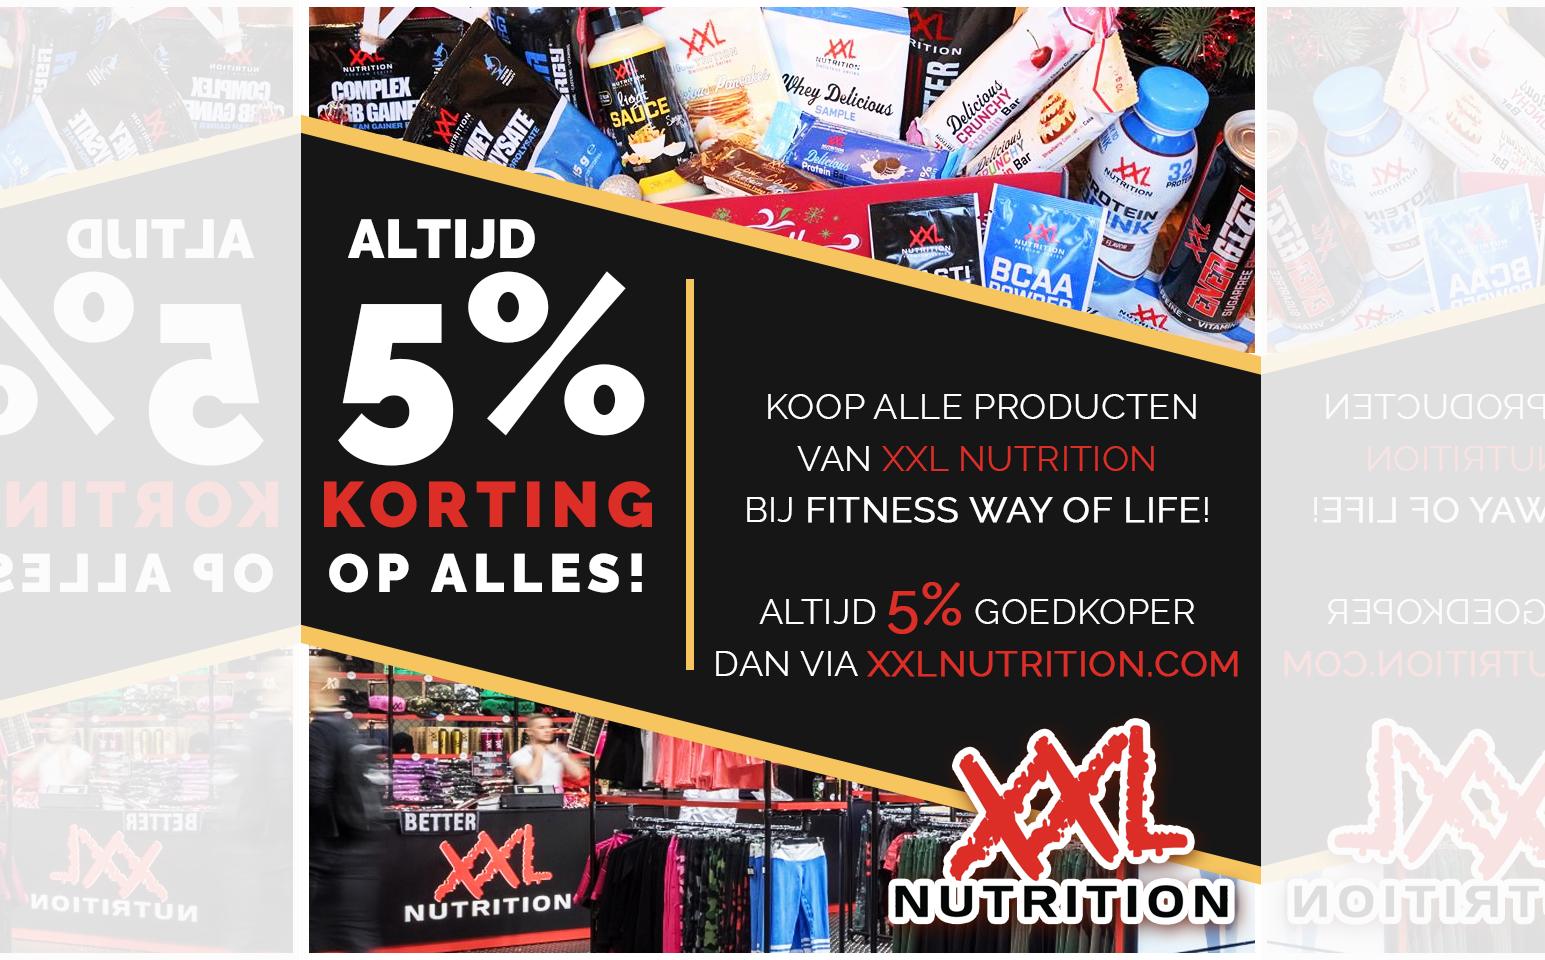 XXL Nutrition 5% korting1